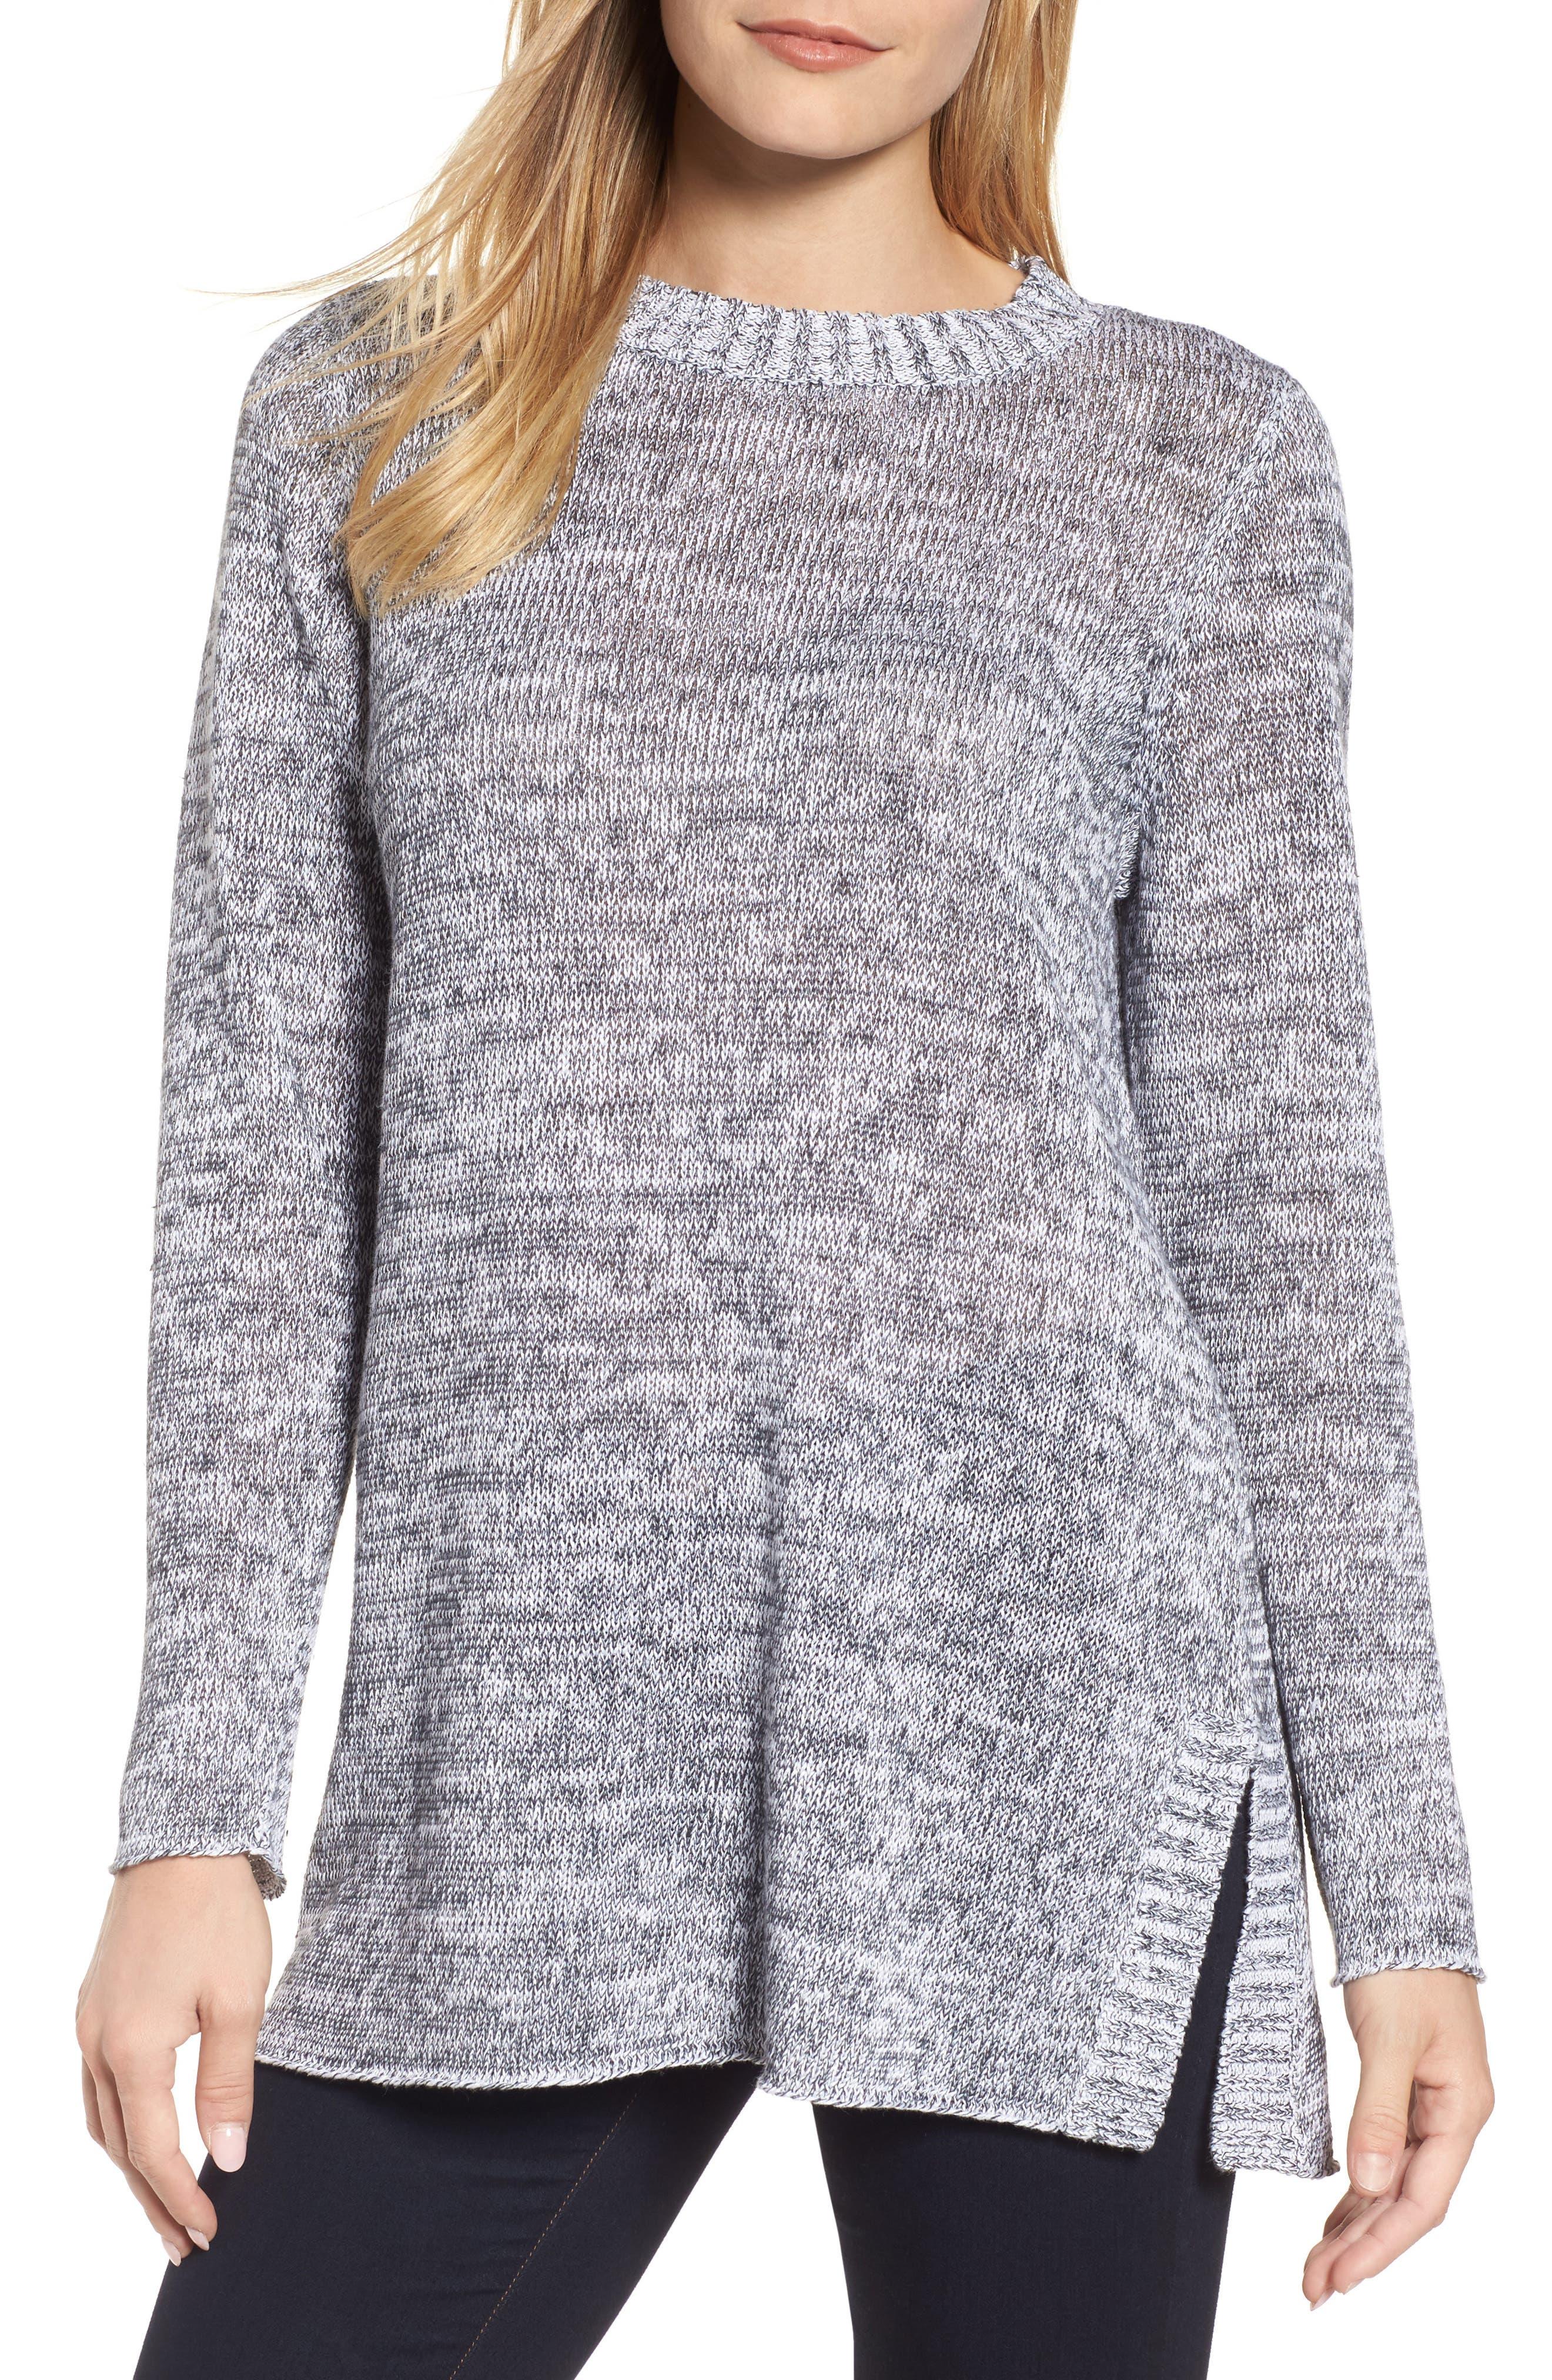 Alternate Image 1 Selected - Eileen Fisher Organic Linen Crewneck Sweater